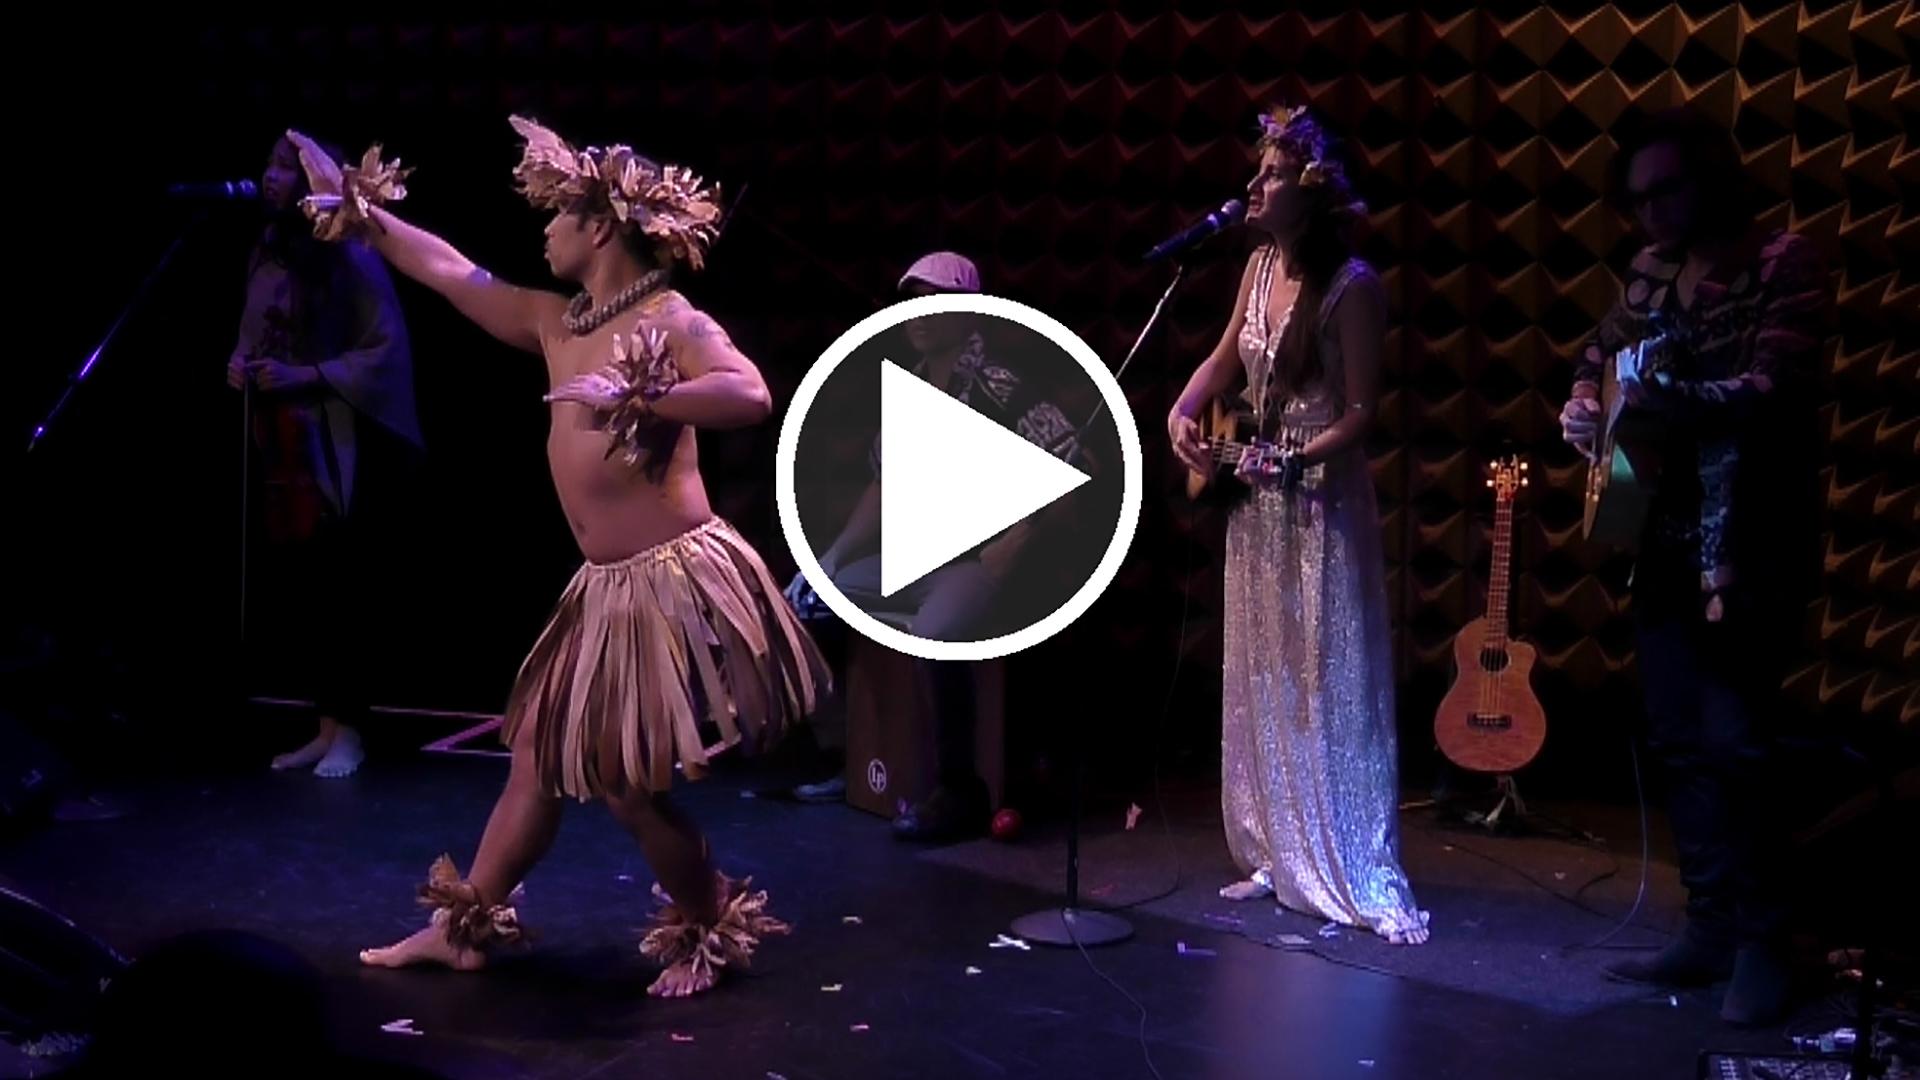 Taimane with her quartet & Polynesian dancer